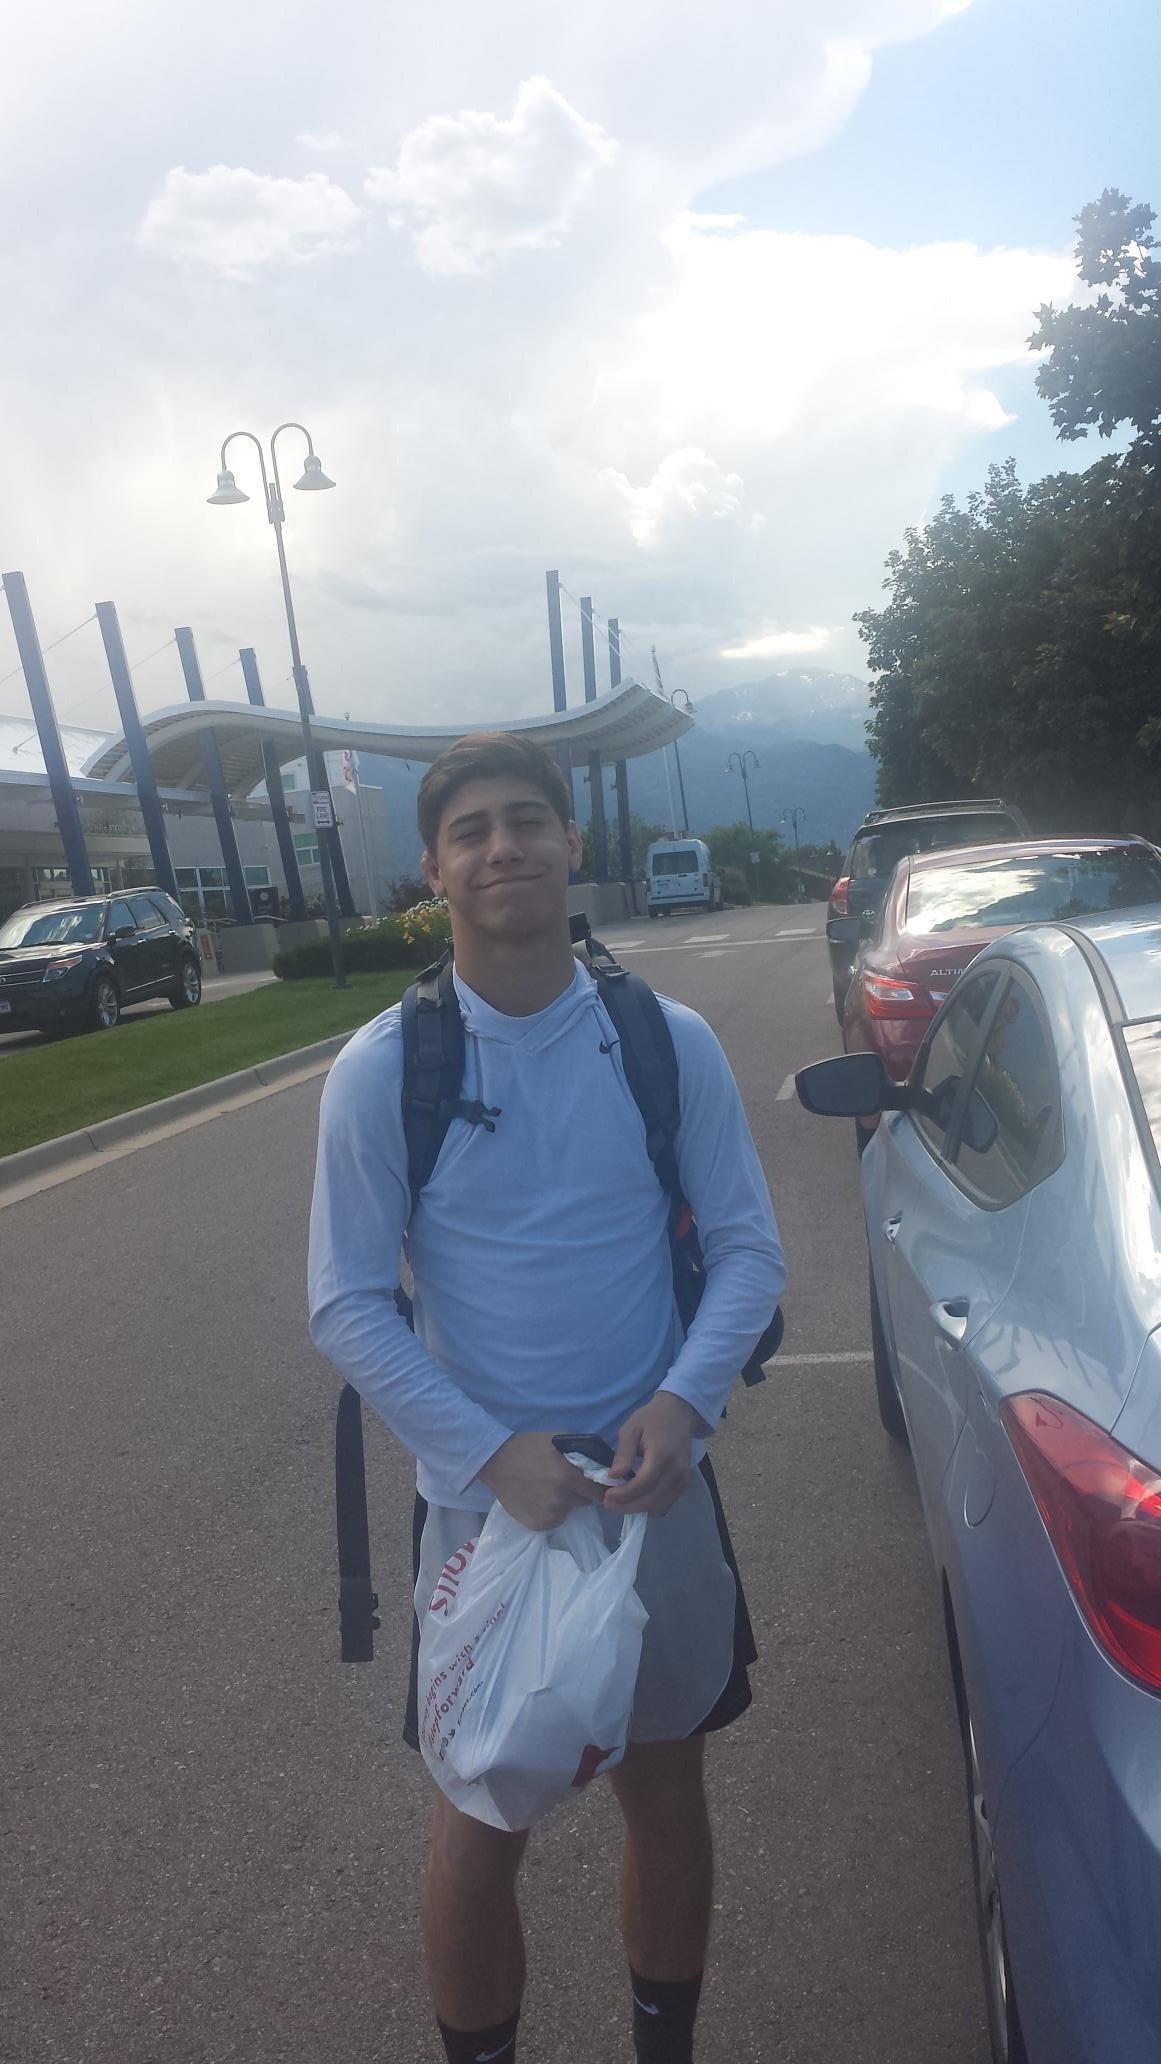 anthony ulaszek | Trackwrestling Profile